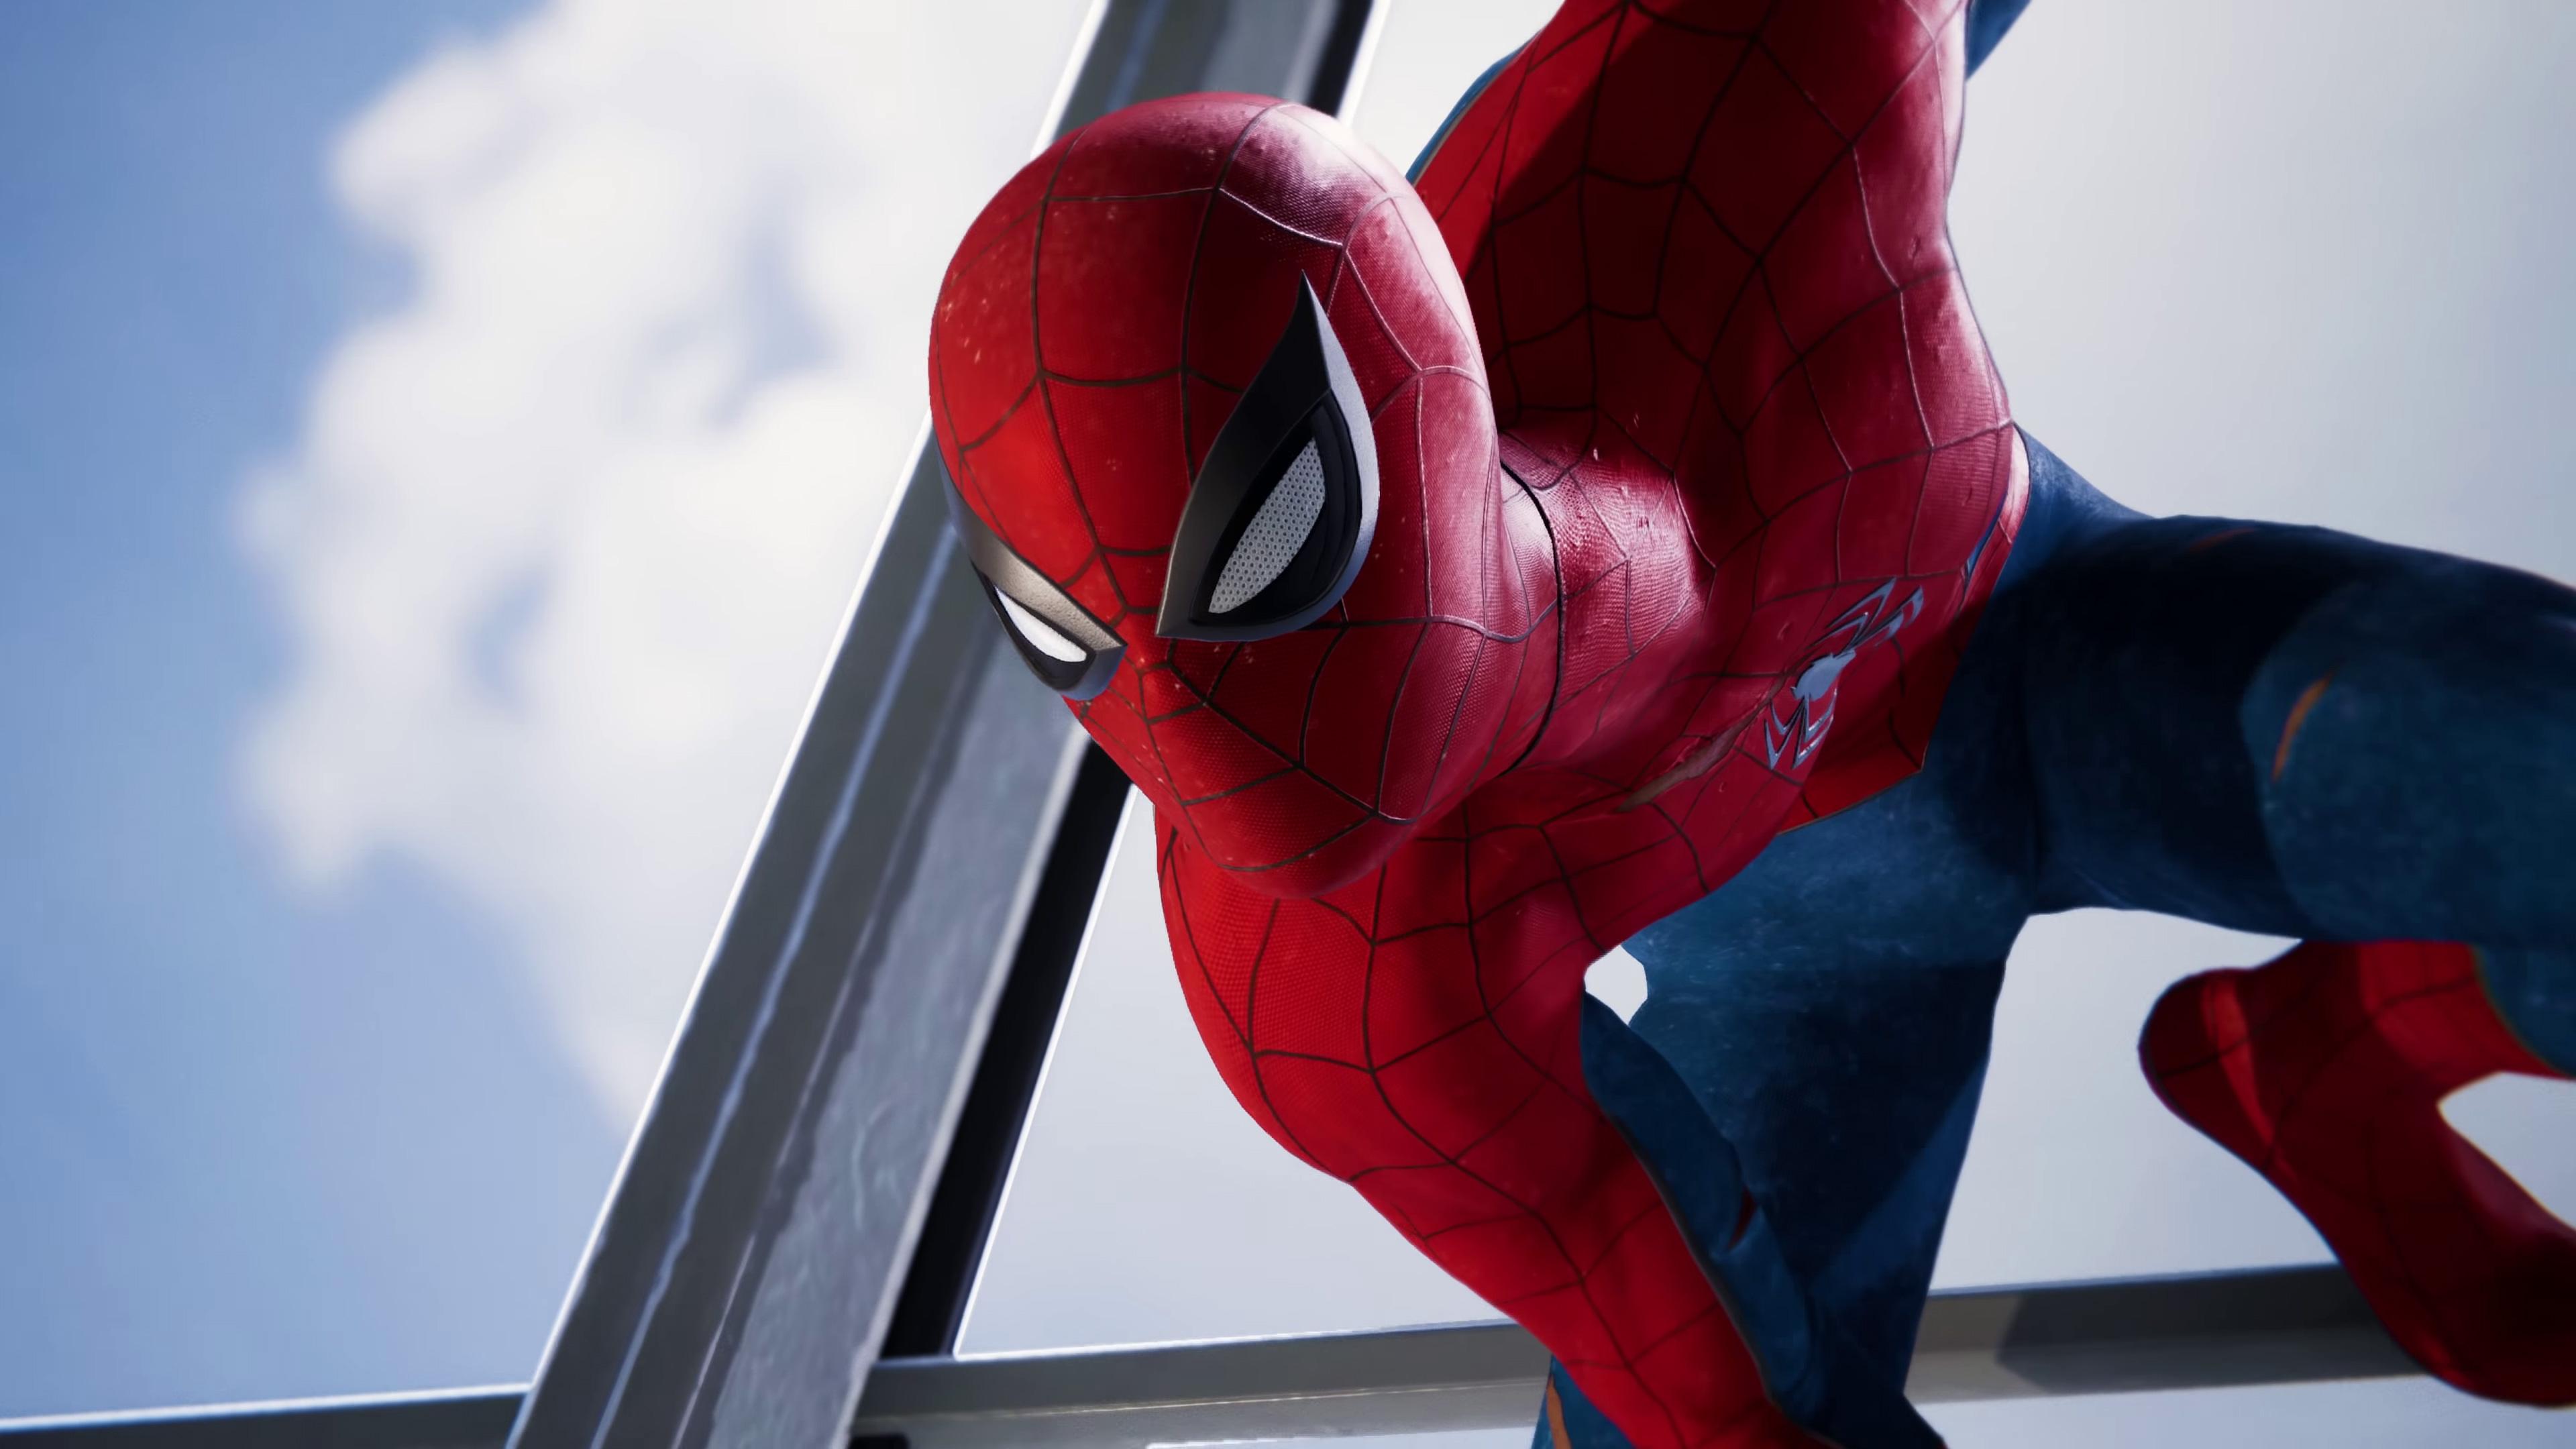 1366x768 Spiderman Ps4 2018 4k 1366x768 Resolution Hd 4k Wallpapers